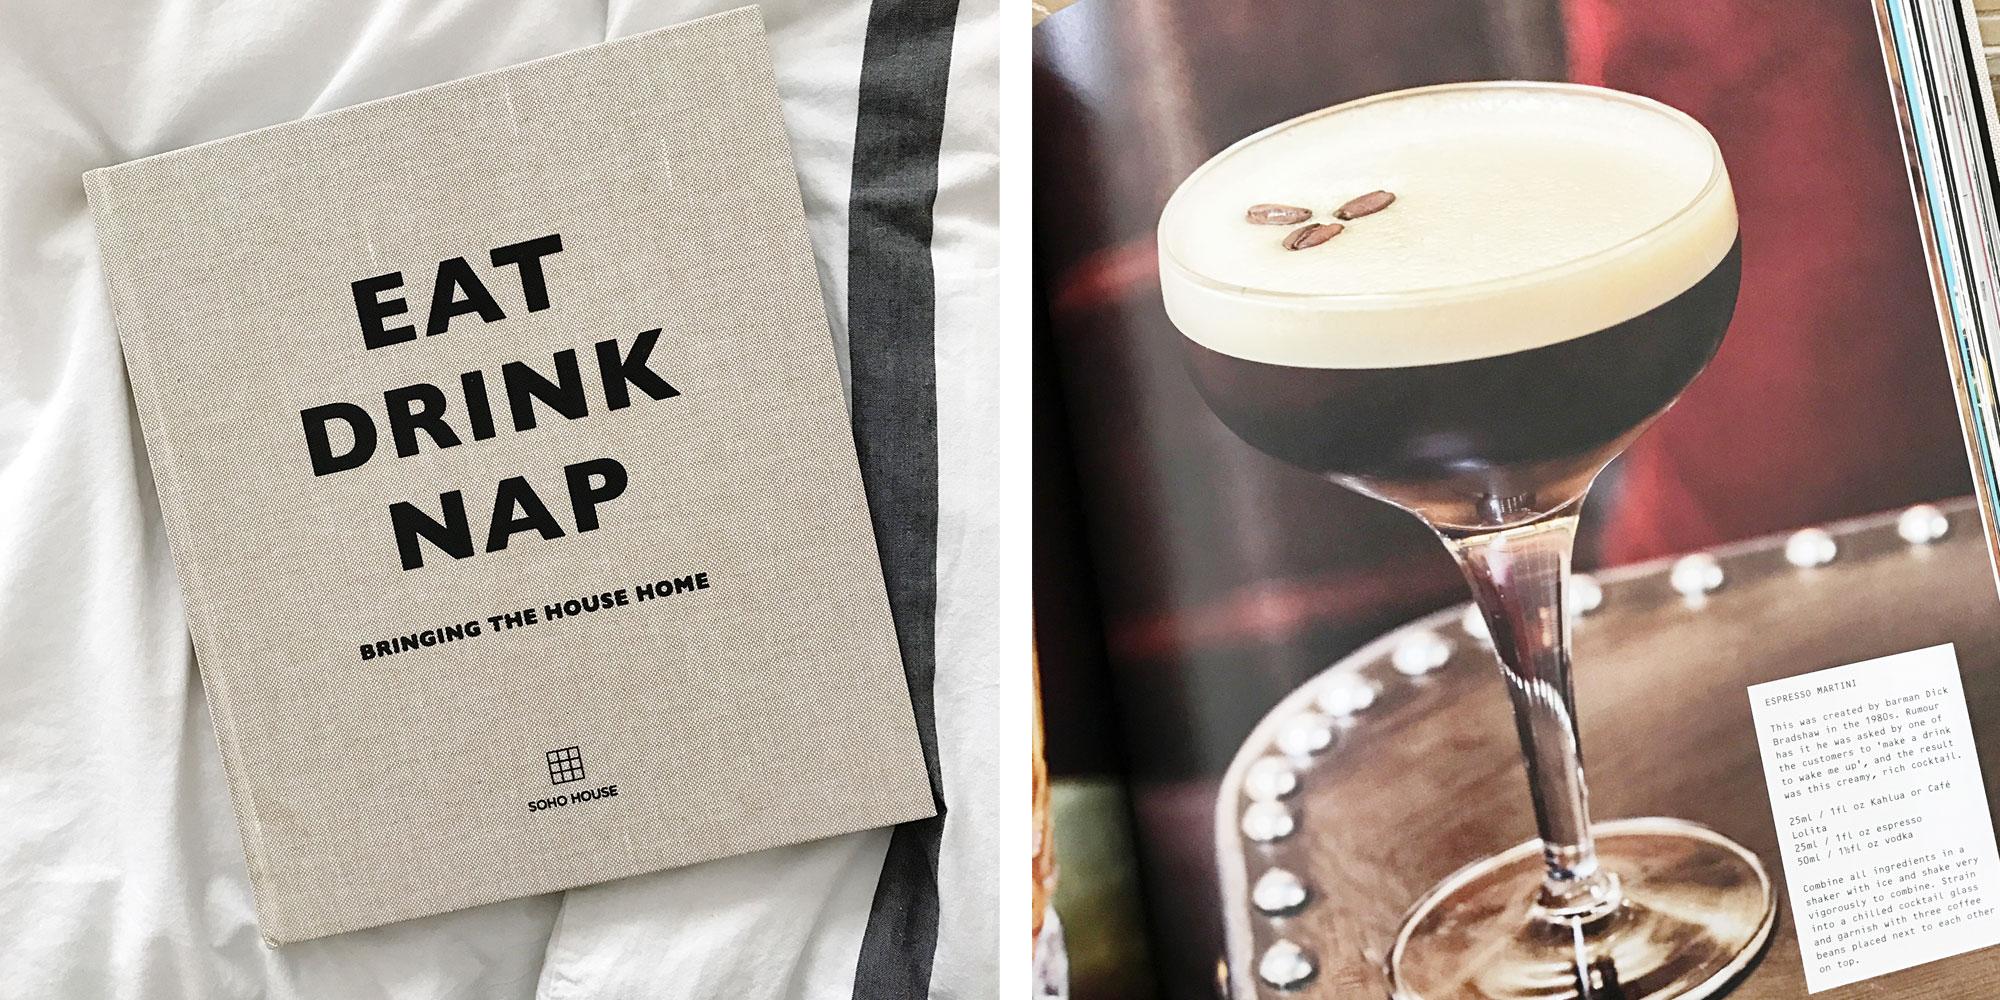 eat drink nap soho house book